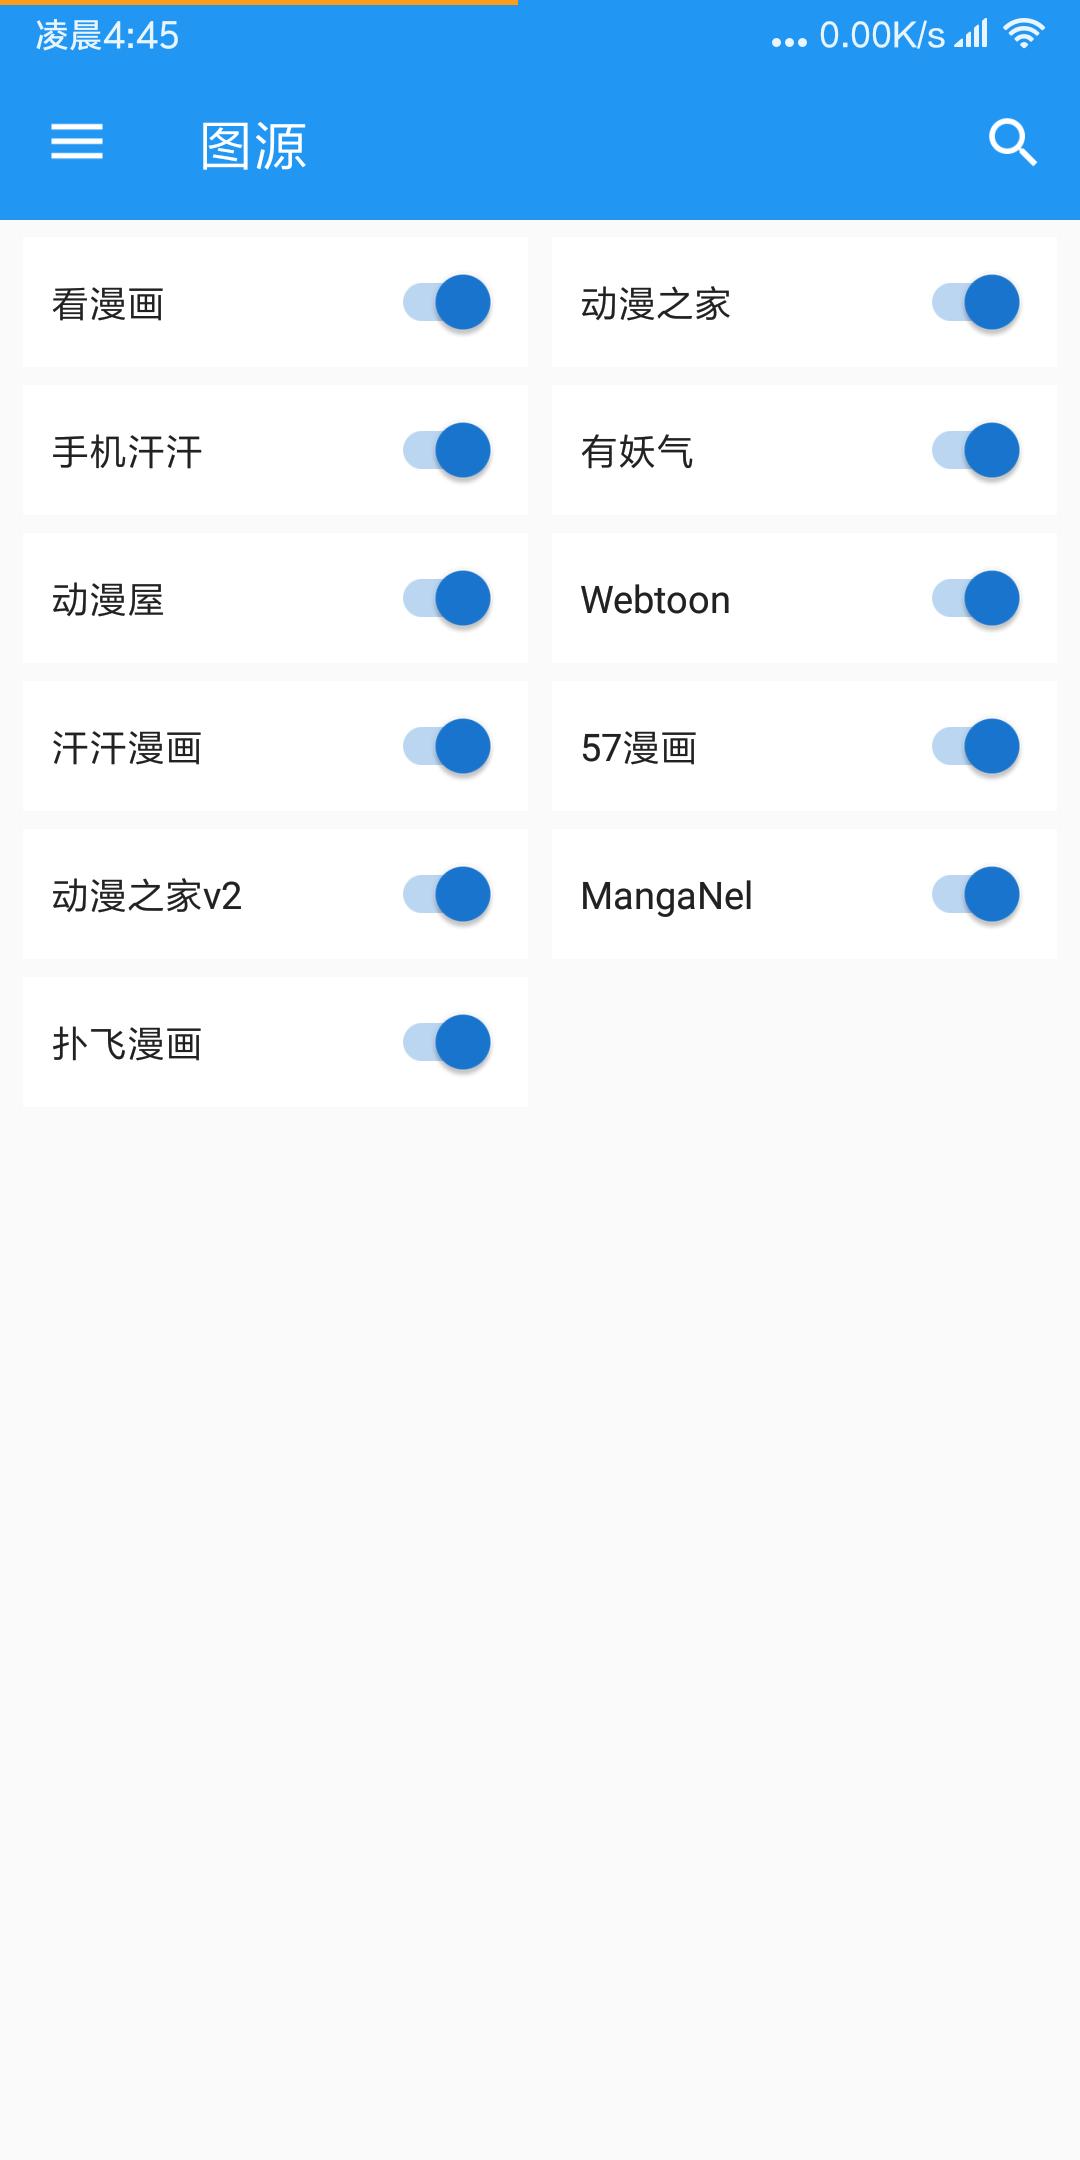 Screenshot_2018-11-13-04-45-33-175_com.hiroshi.cimoc.png